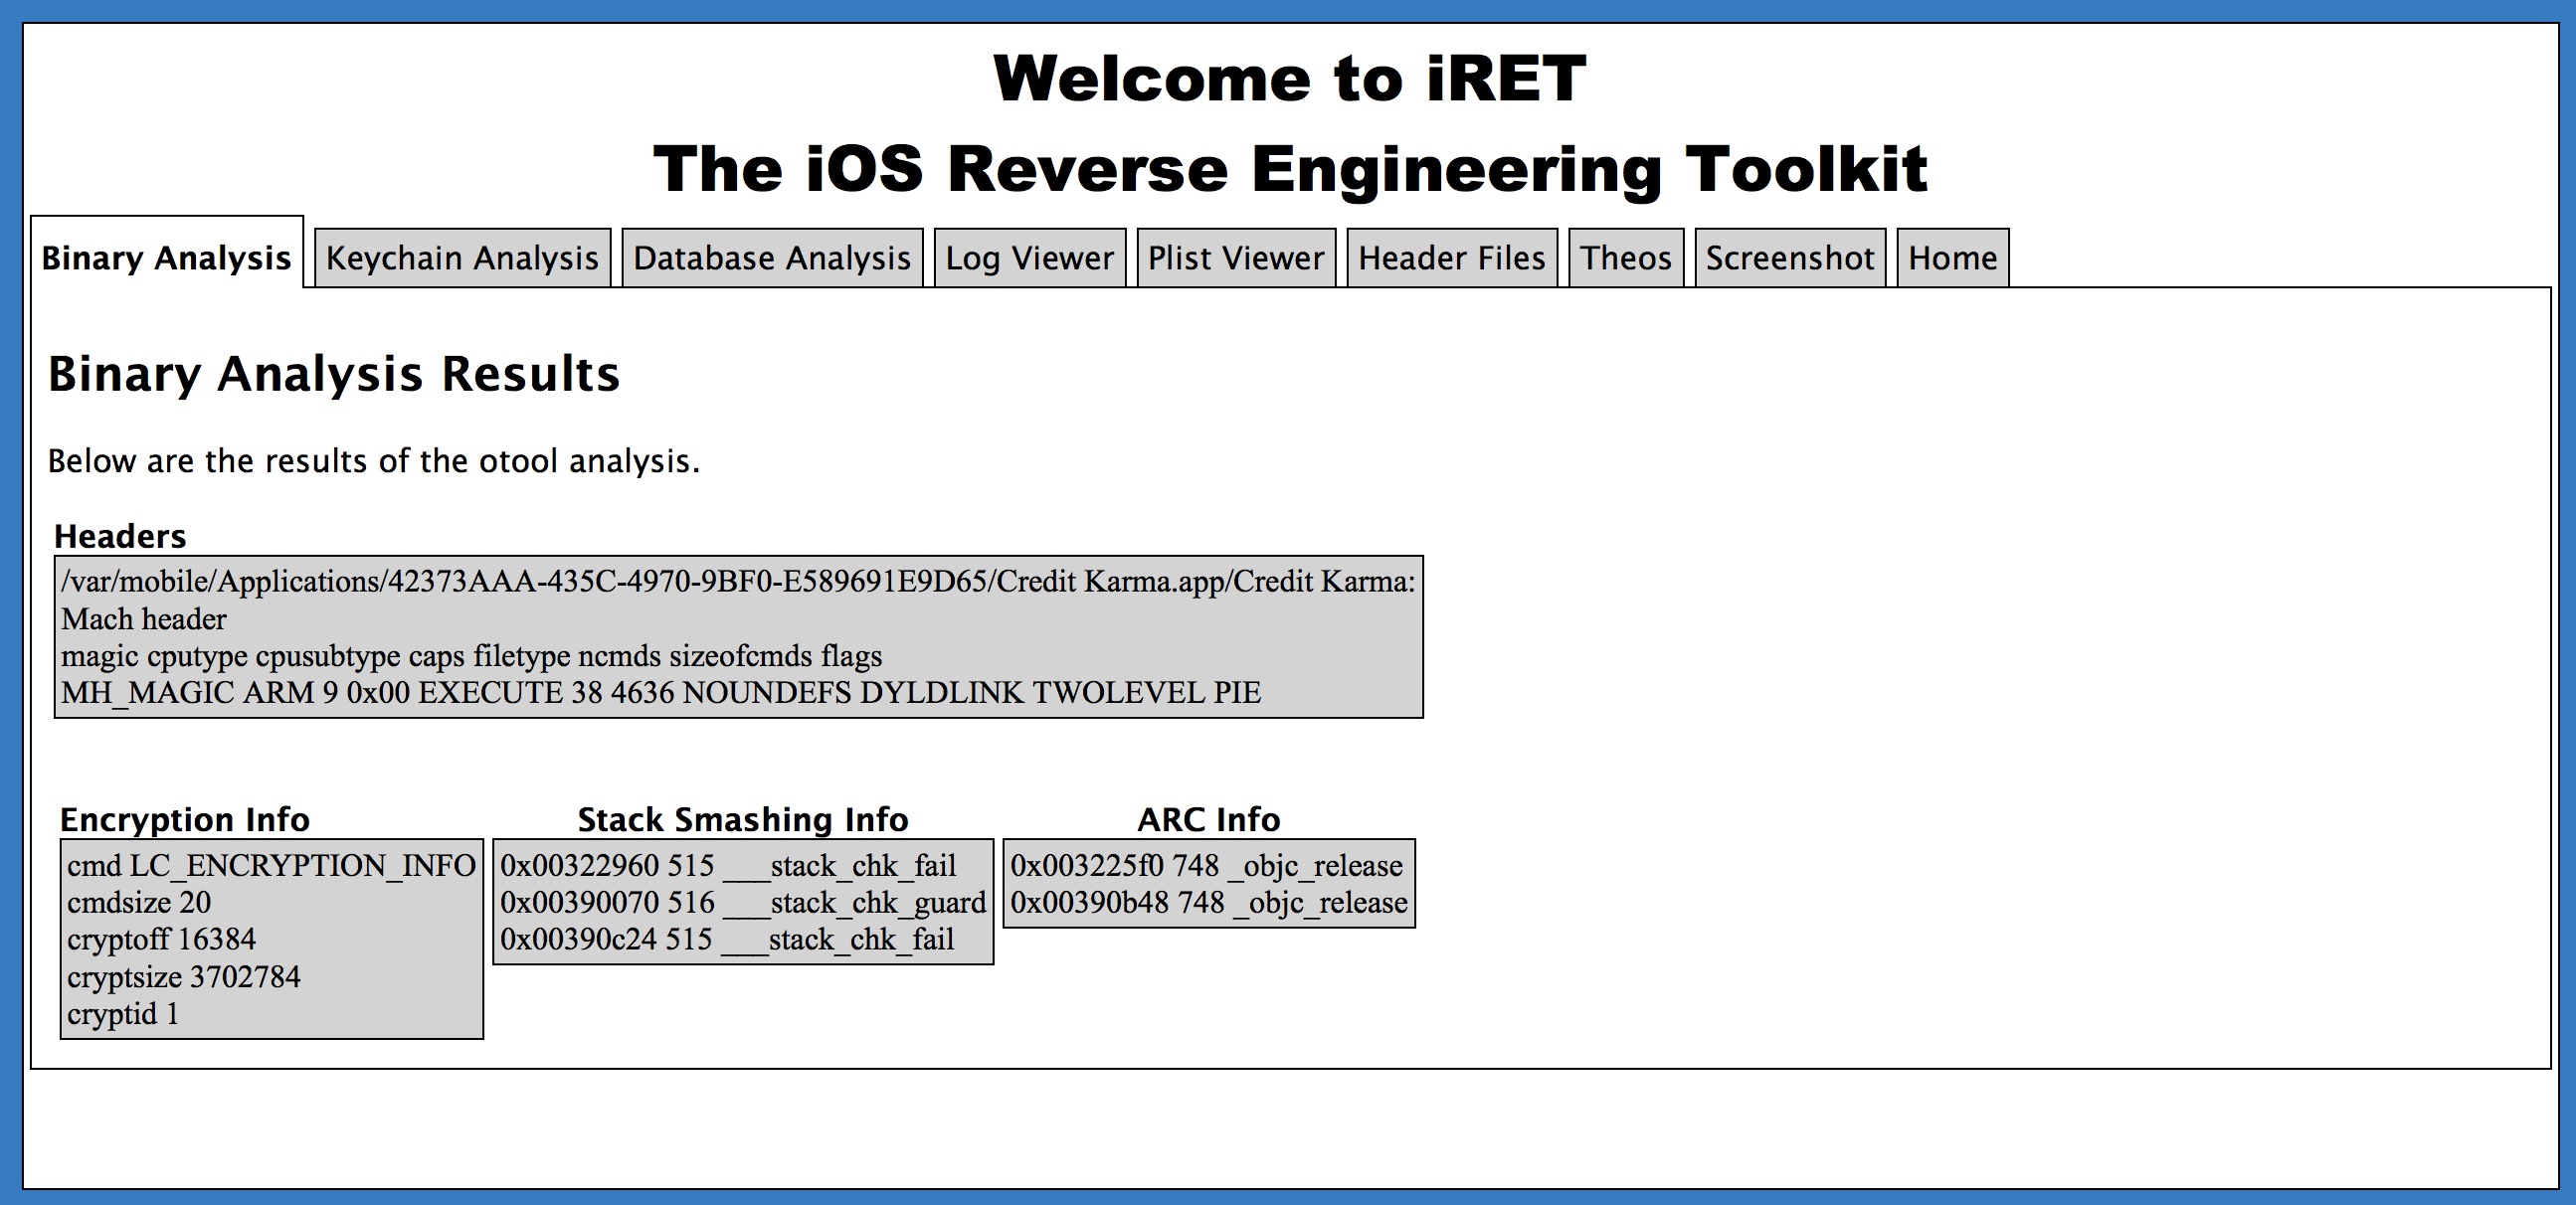 Introducing the iOS Reverse Engineering Toolkit | Veracode